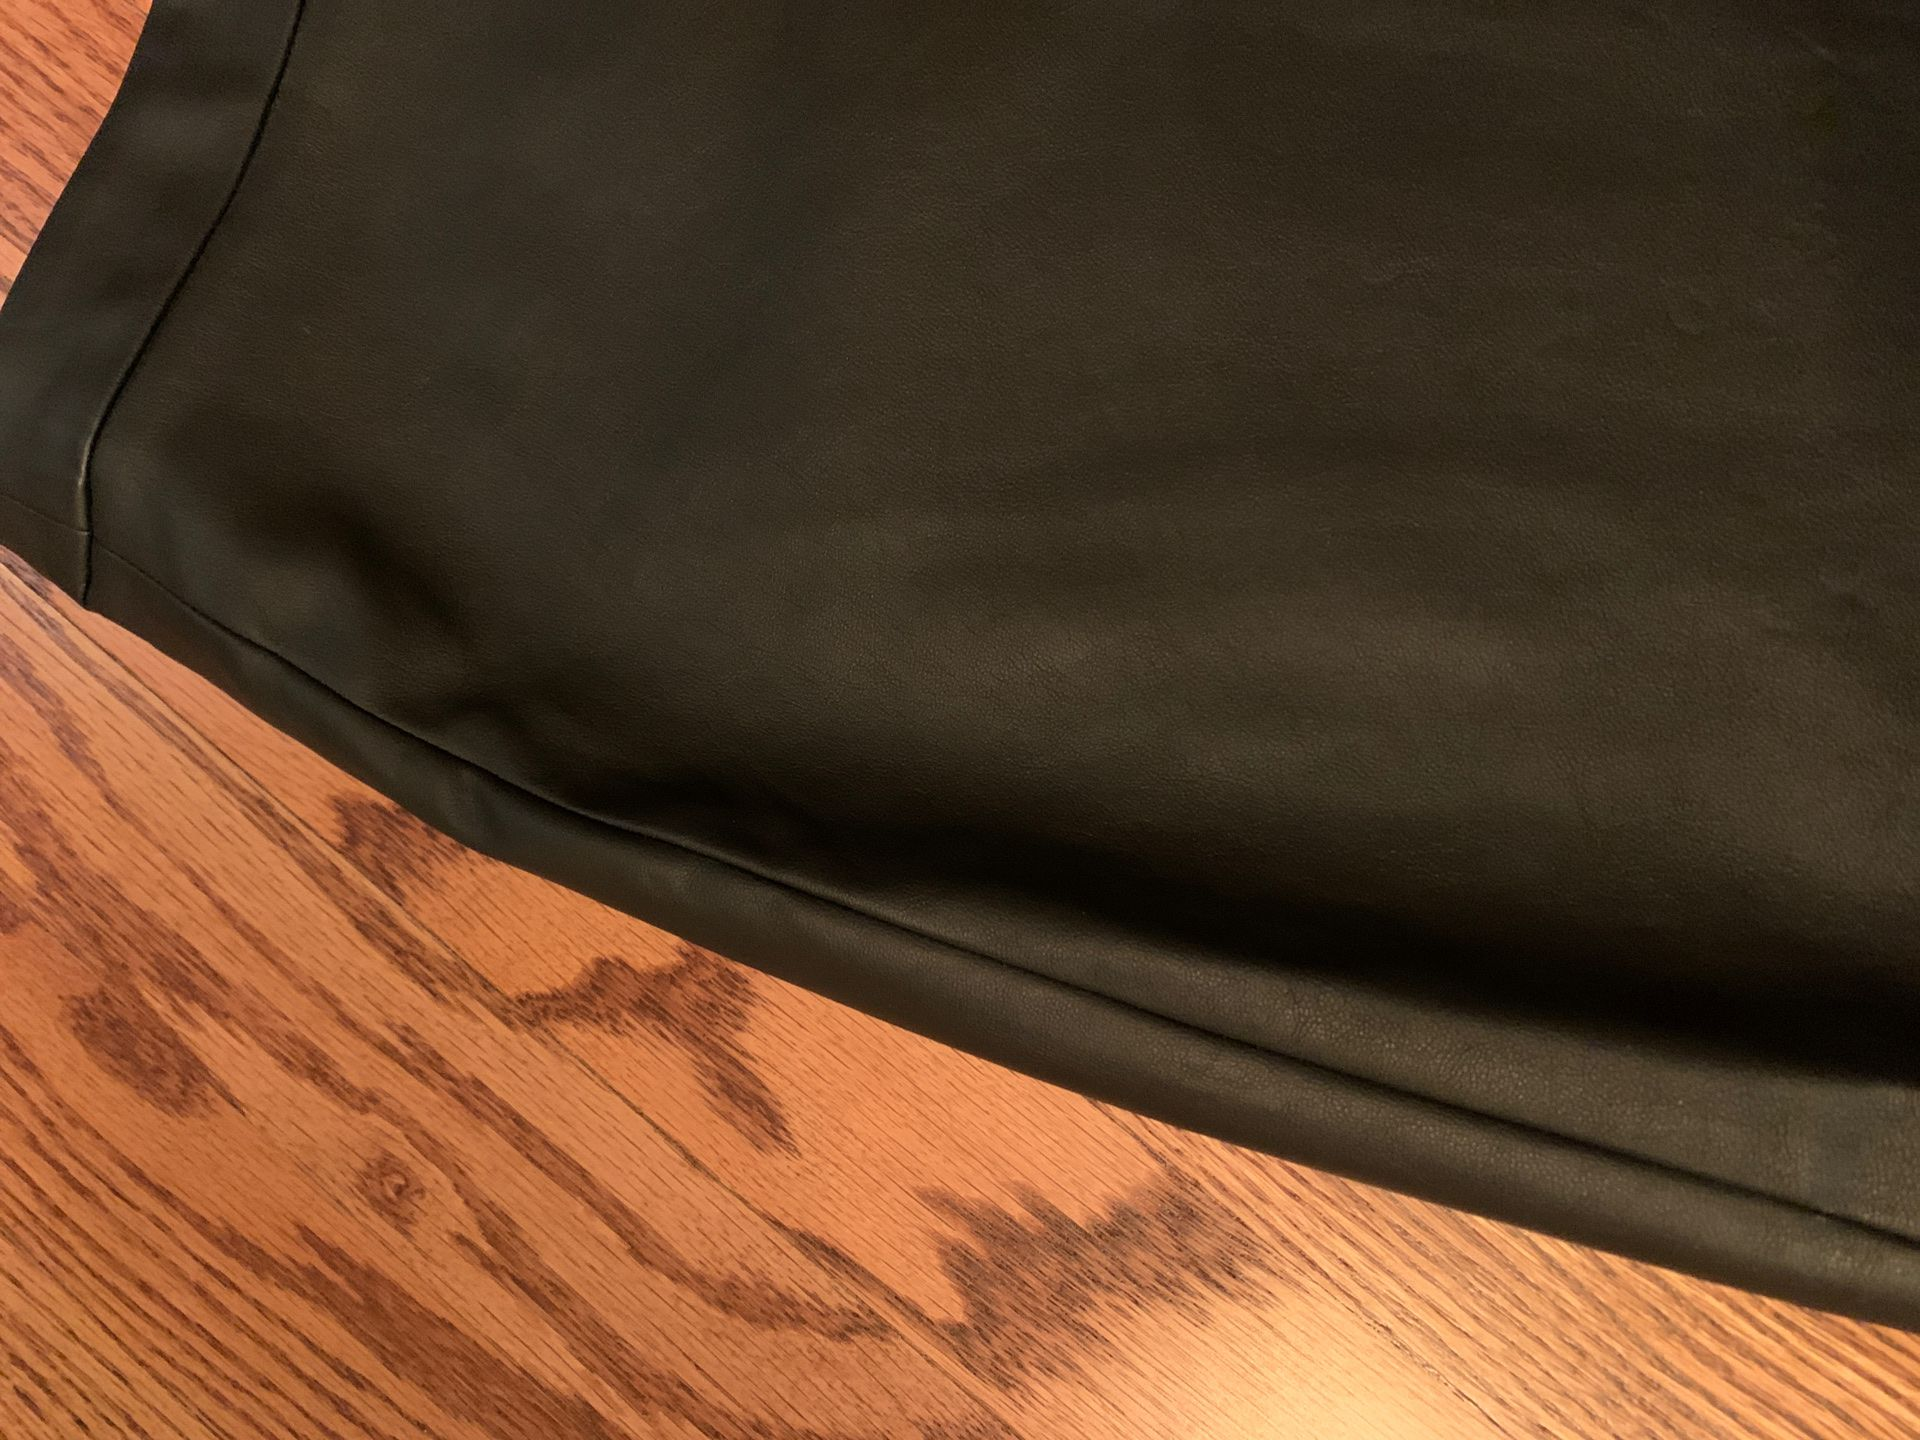 New w Tags BBDakota /Steve Madden Faux Leather Skirt w Zipper (similar to last Picture). Size 10